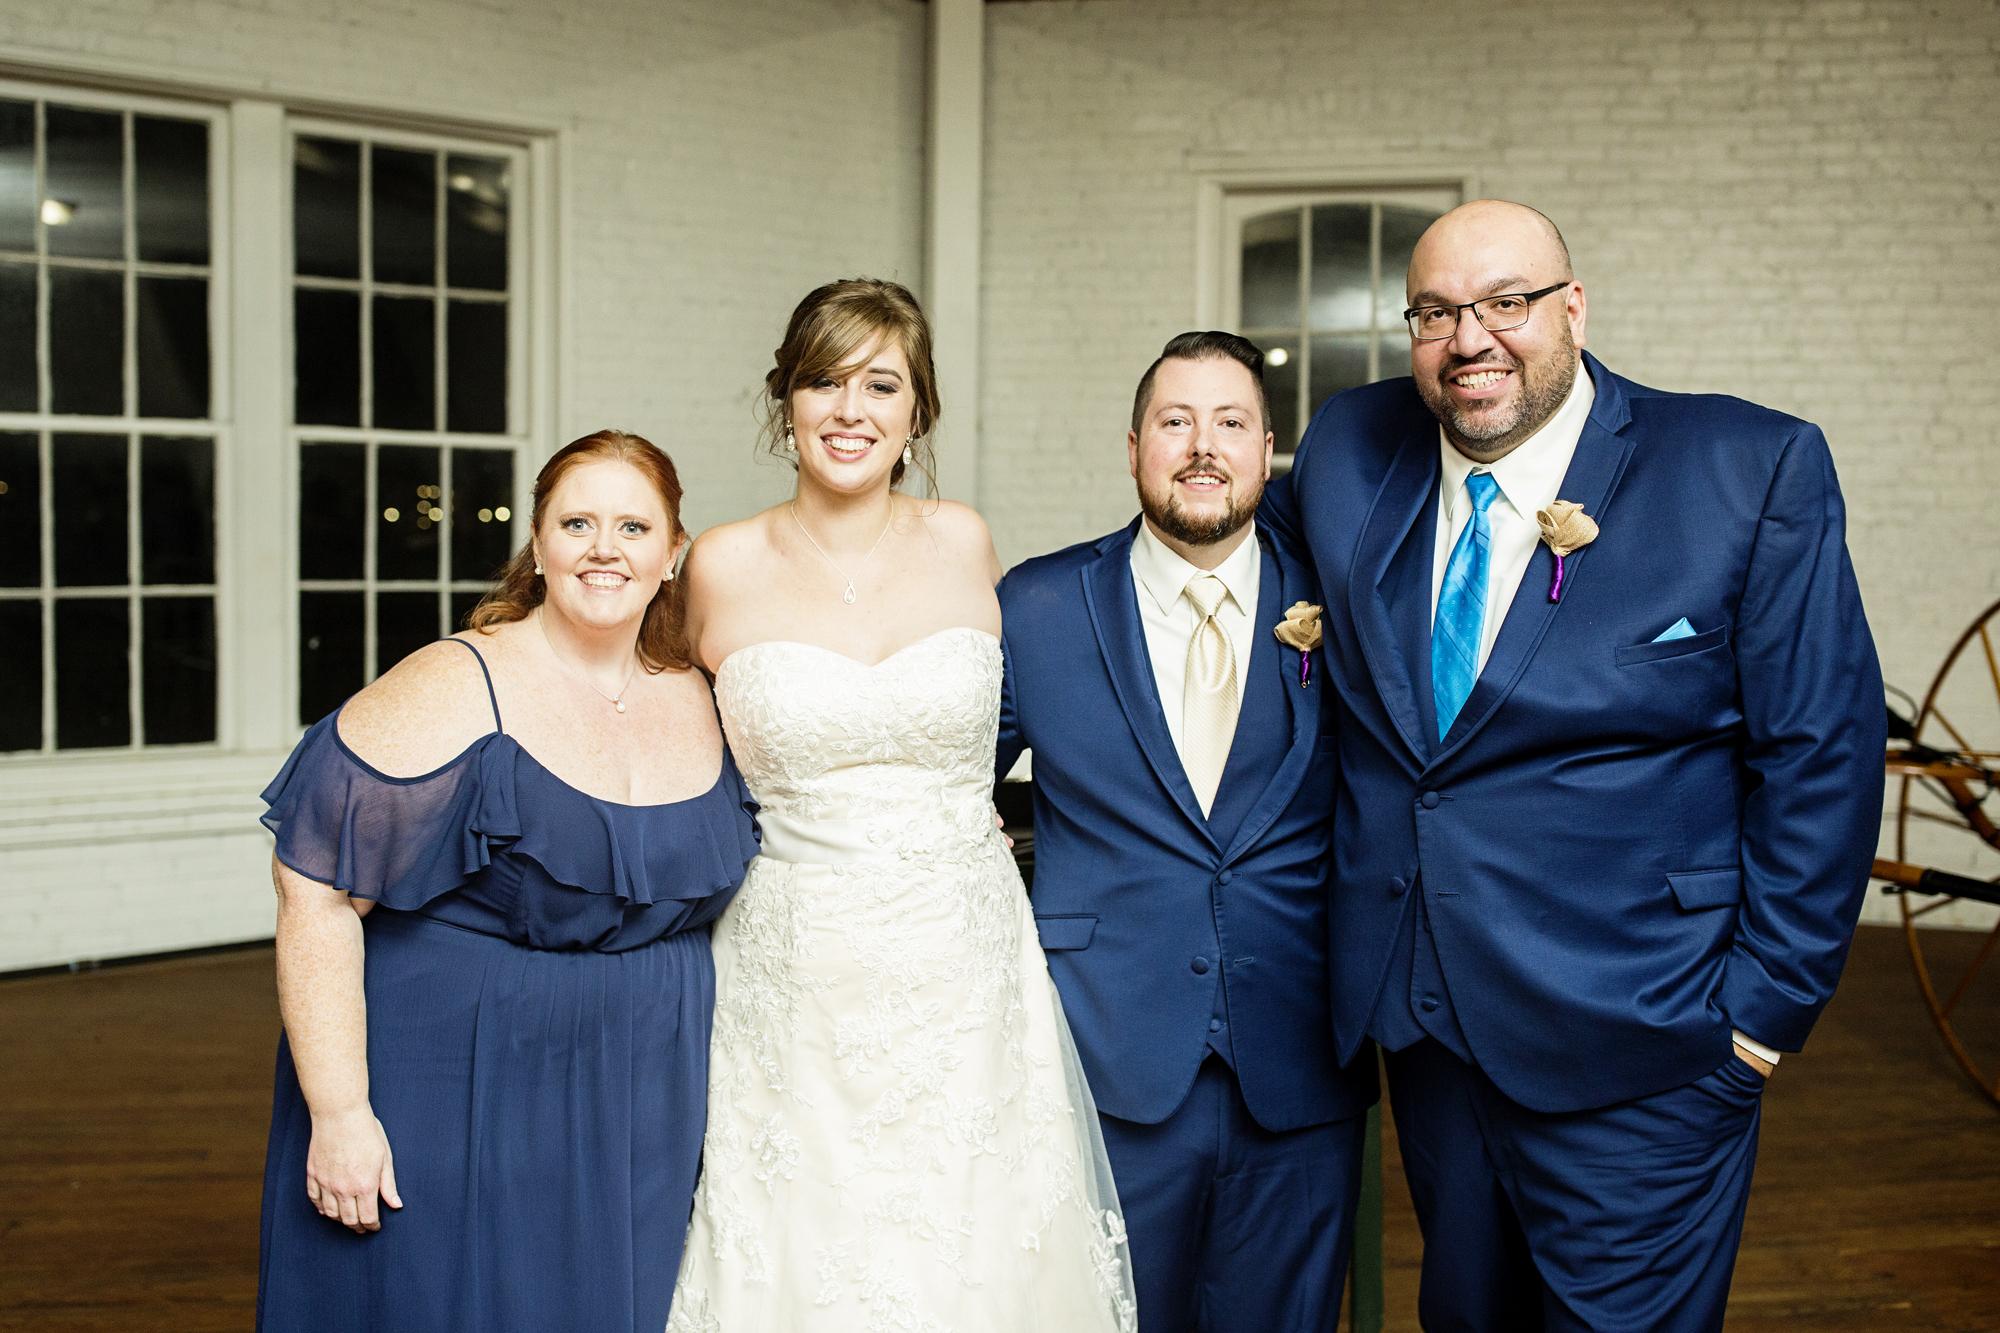 Seriously_Sabrina_Photography_Lexington_Kentucky_21c_Round_Barn_Red_Mile_Wedding_Gorley_89.jpg